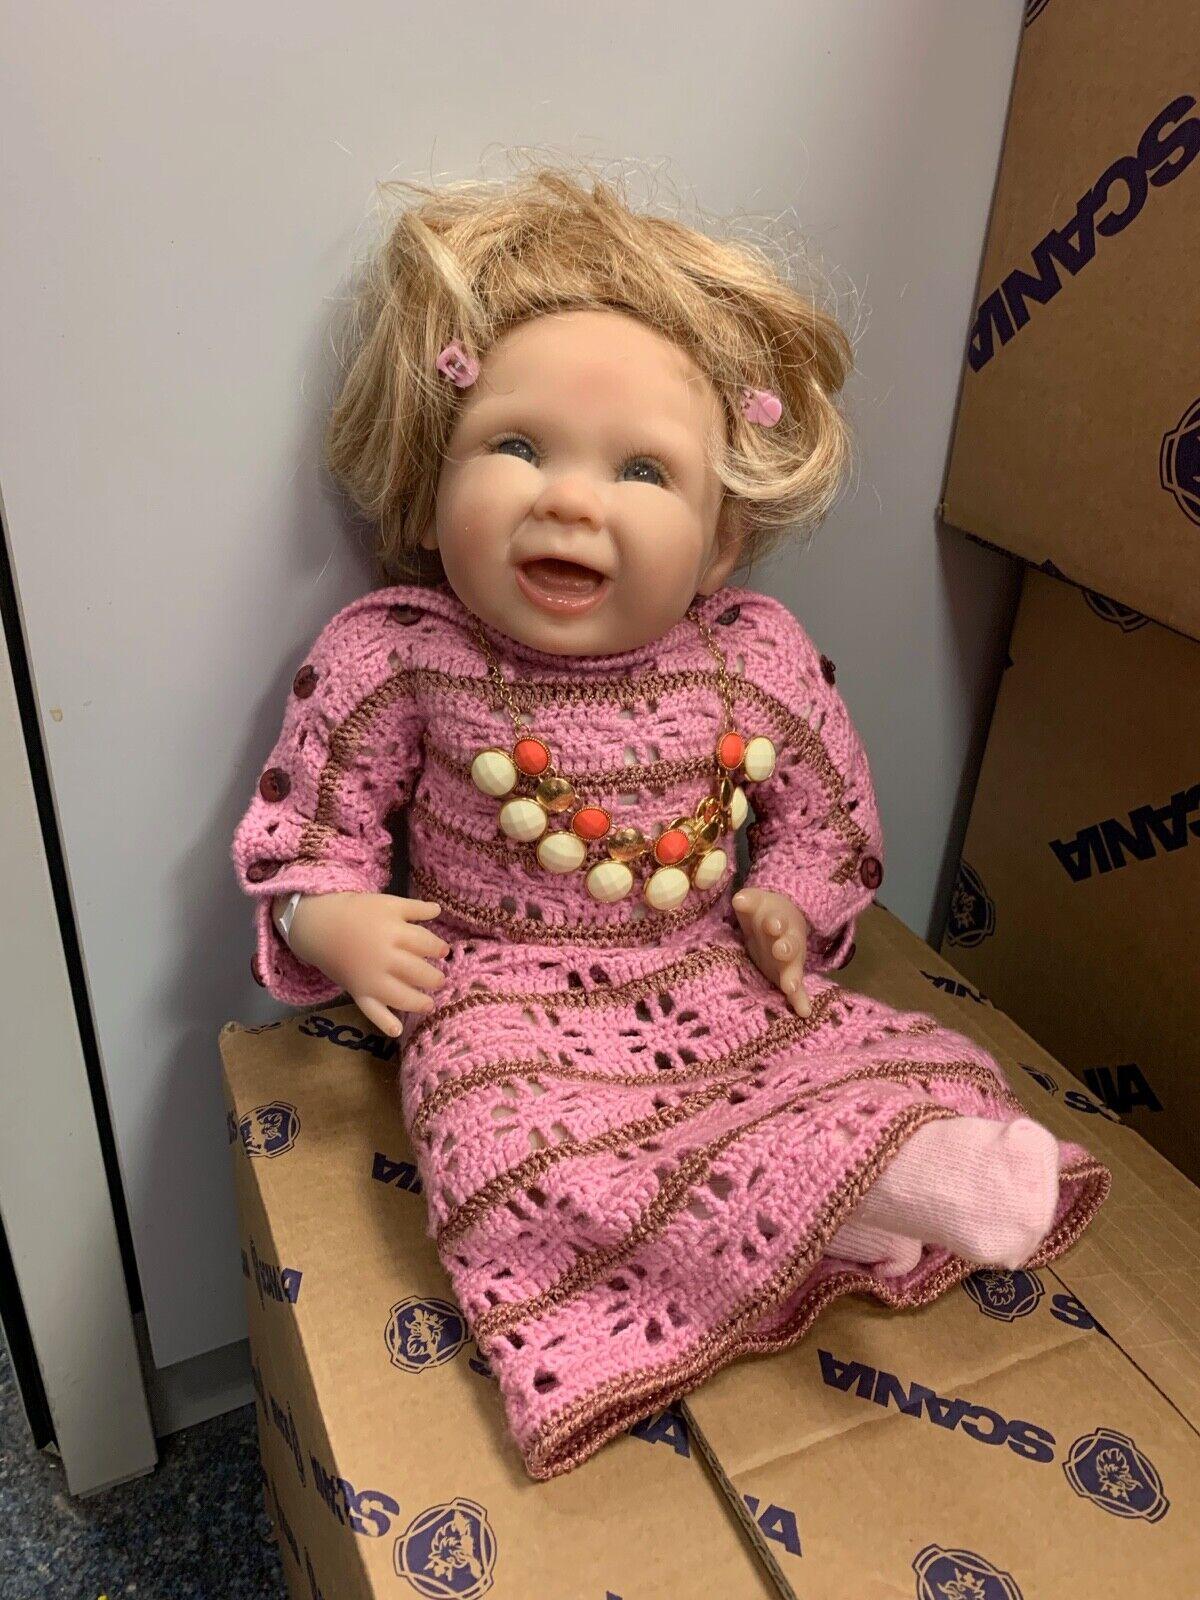 Bonnie chyle vinilo muñeca 46 cm. top estado